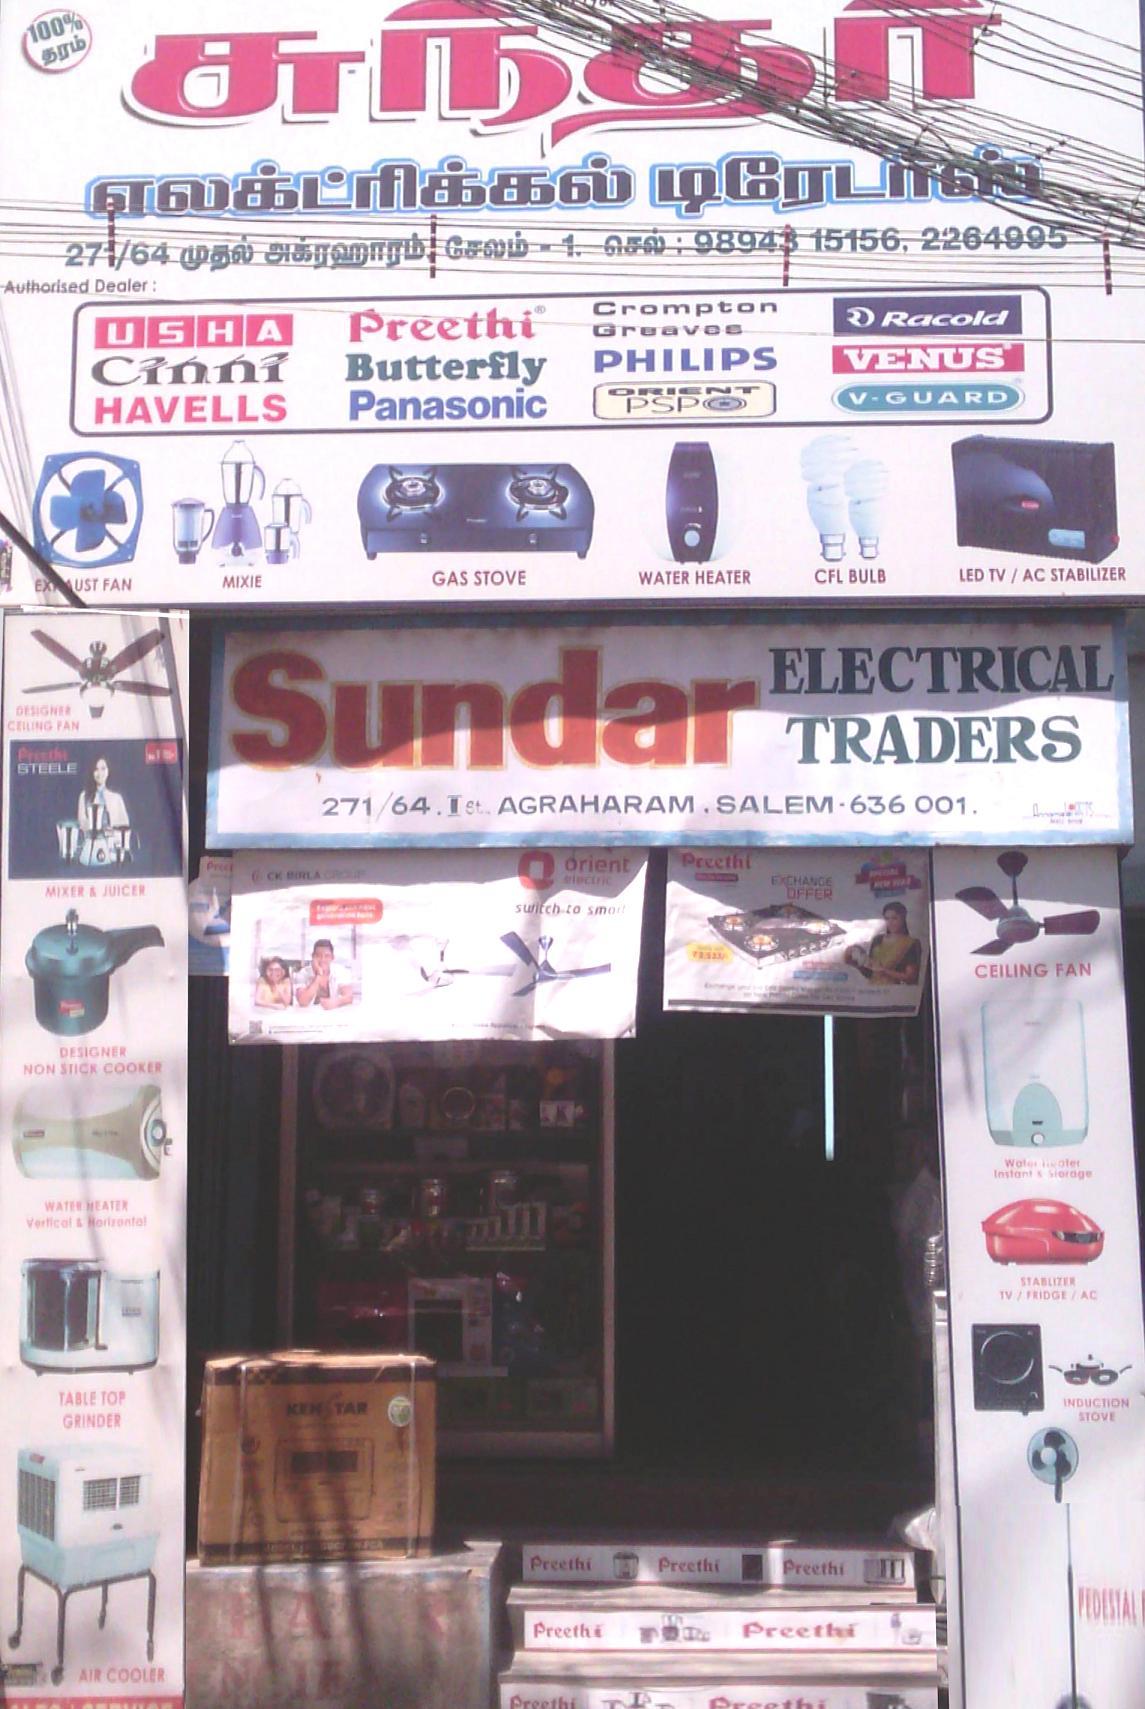 Sundar Electrical Traders